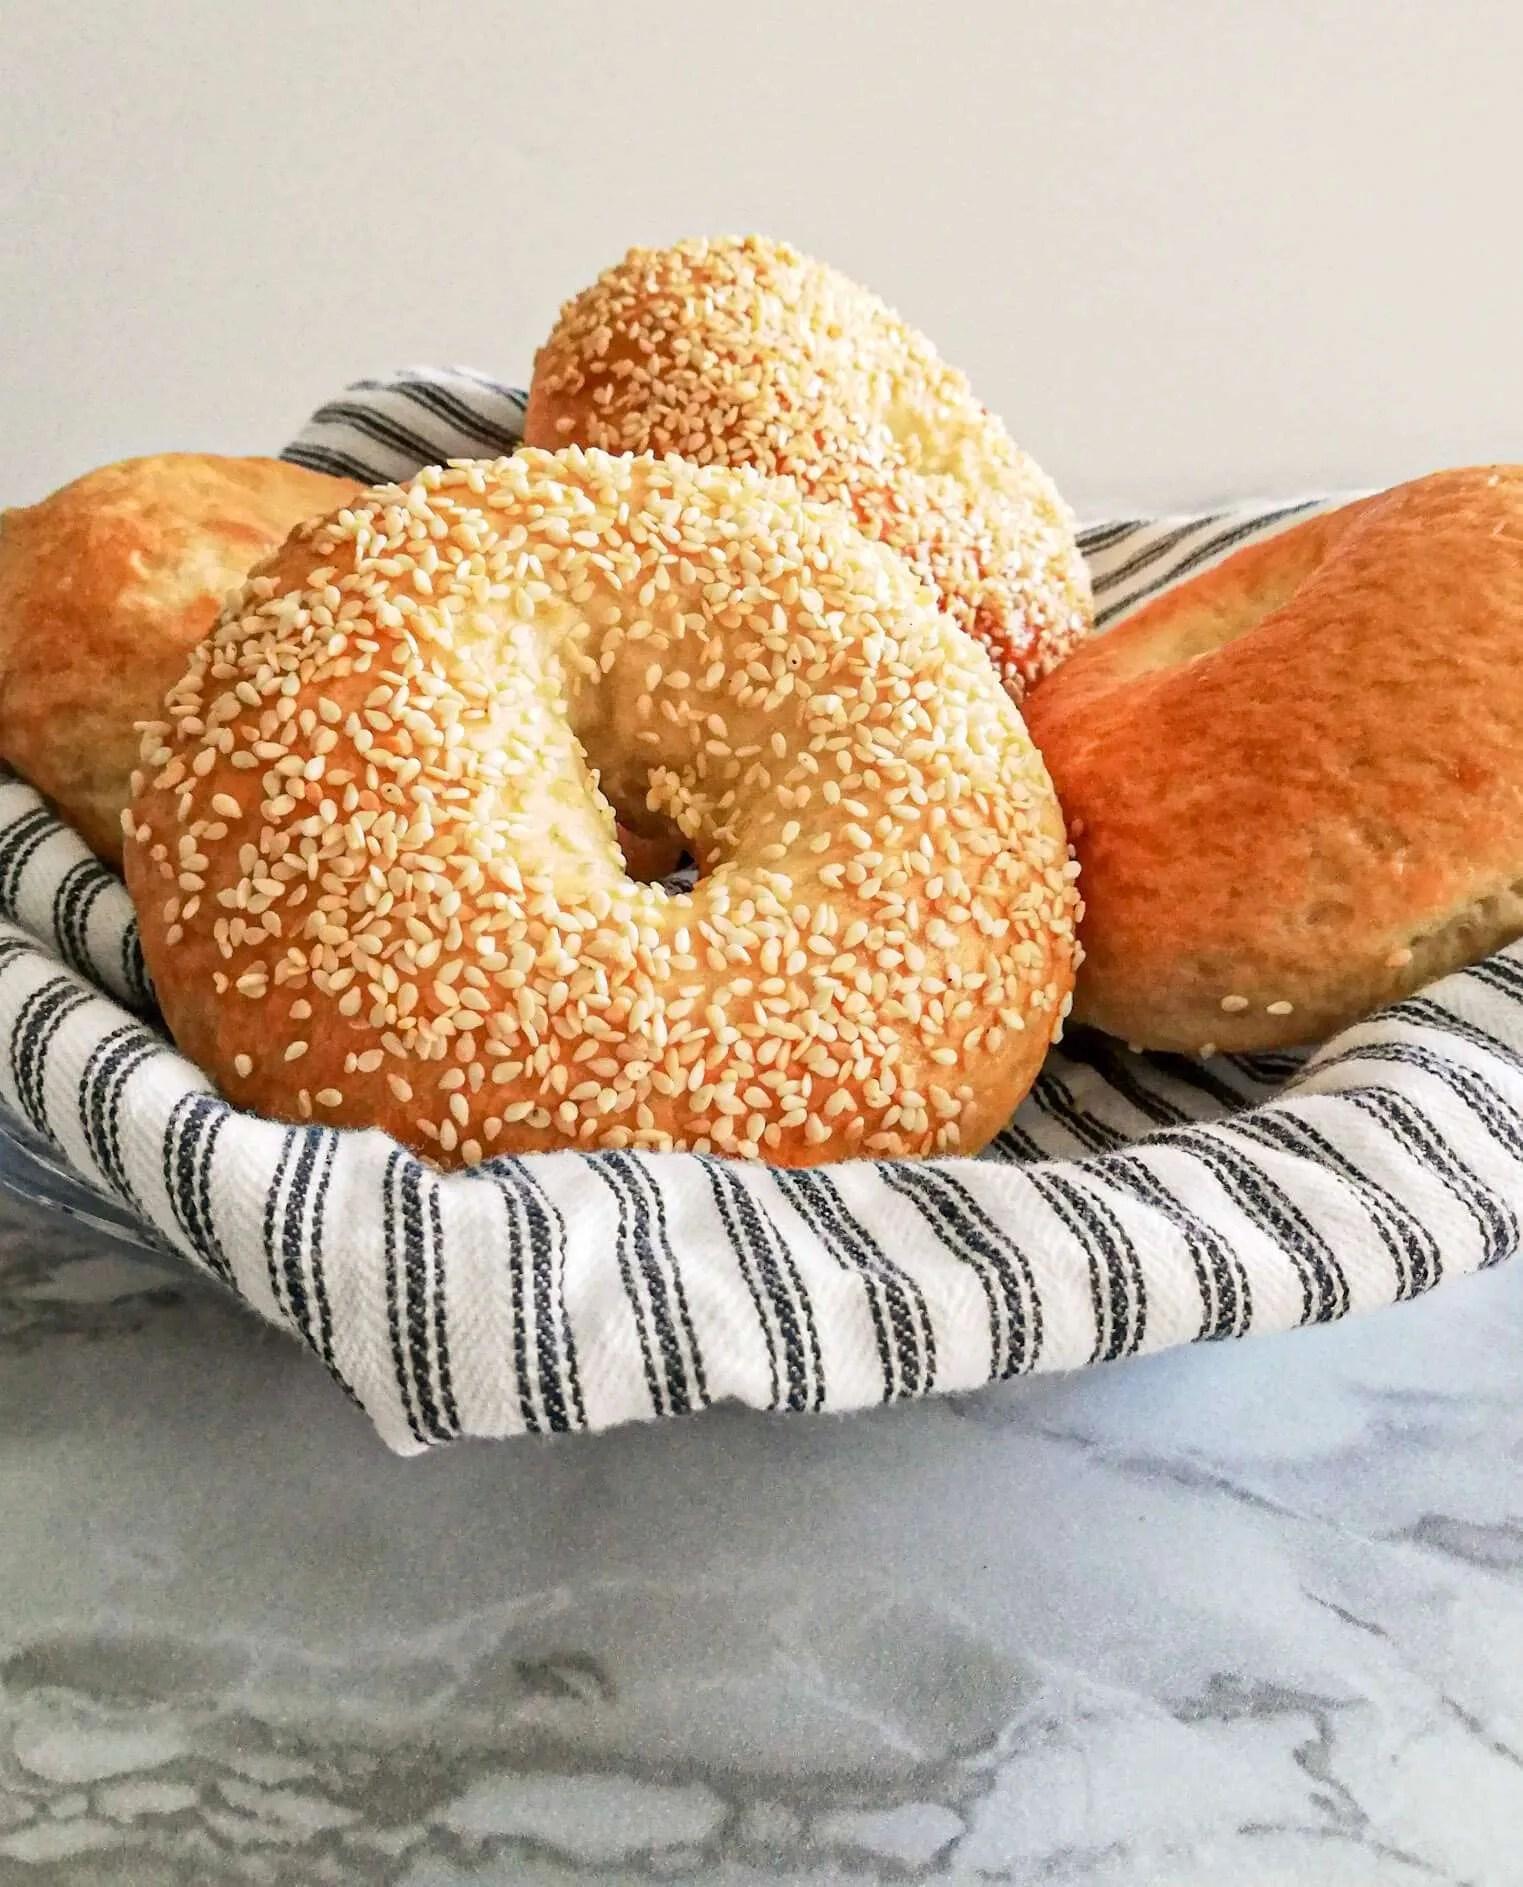 homemade bagels in basket